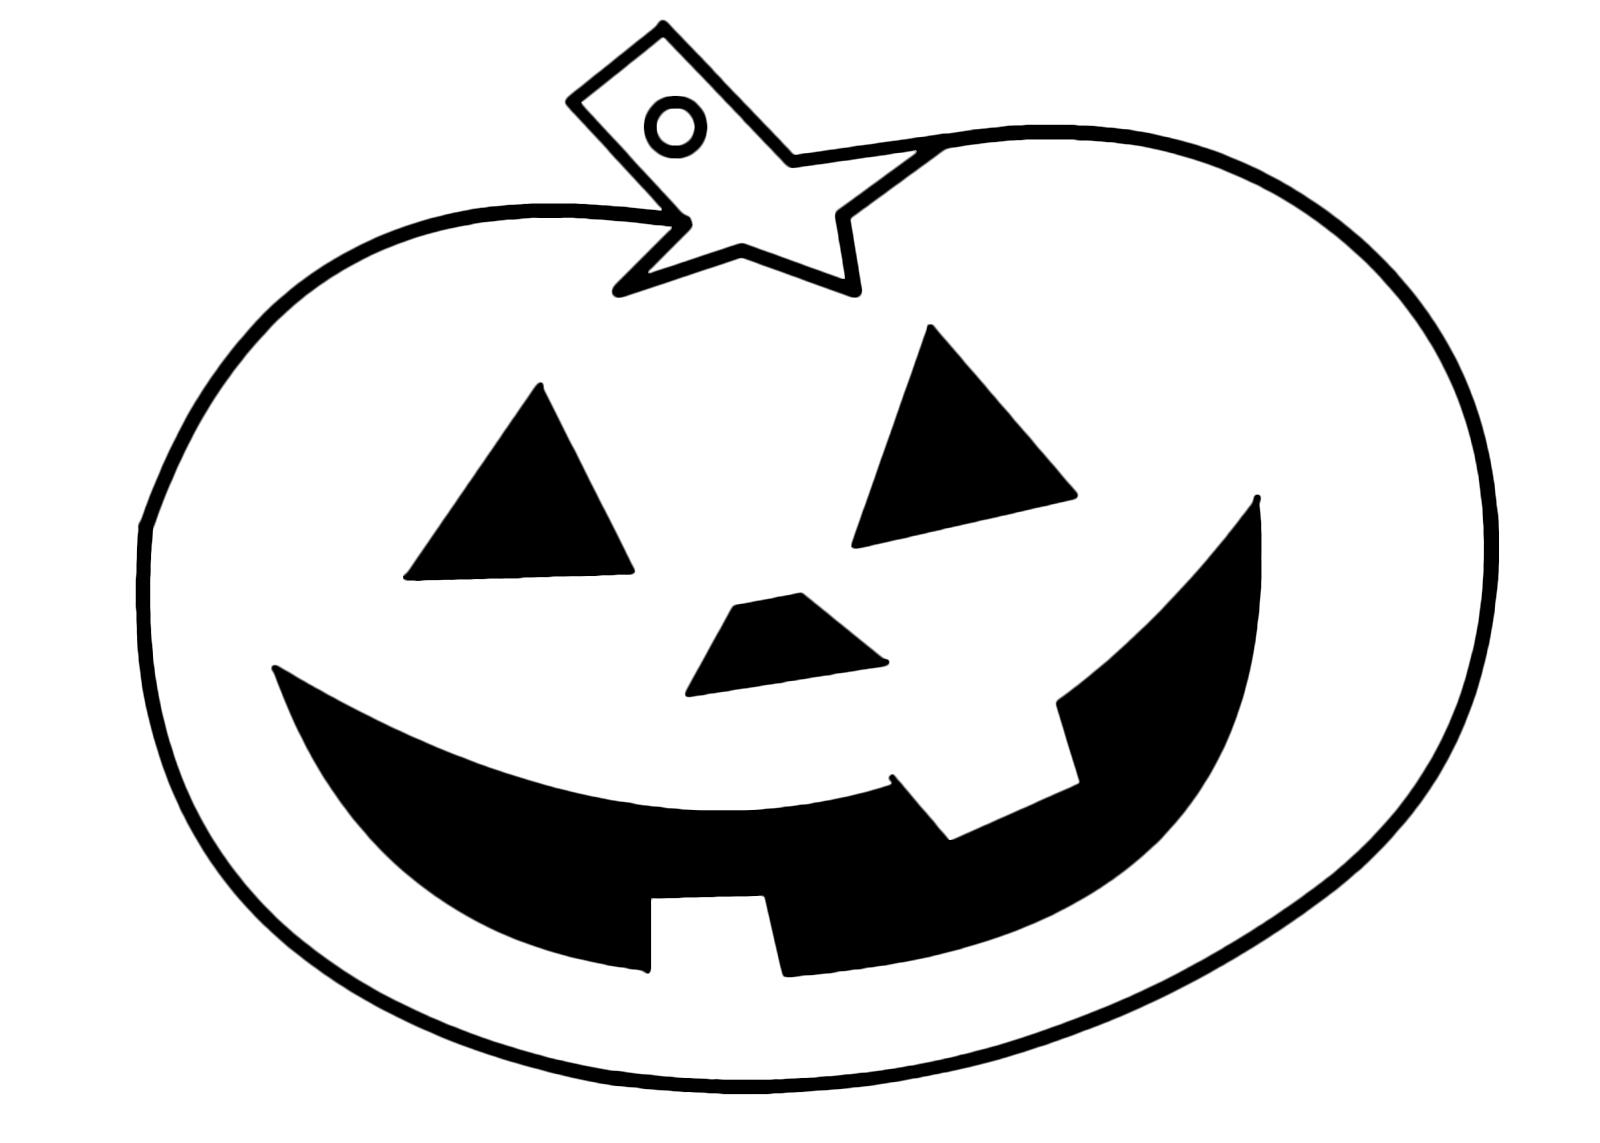 Zucca Halloween Da Colorare: Una Zucca Di Halloween Da Colorare Tutta Di